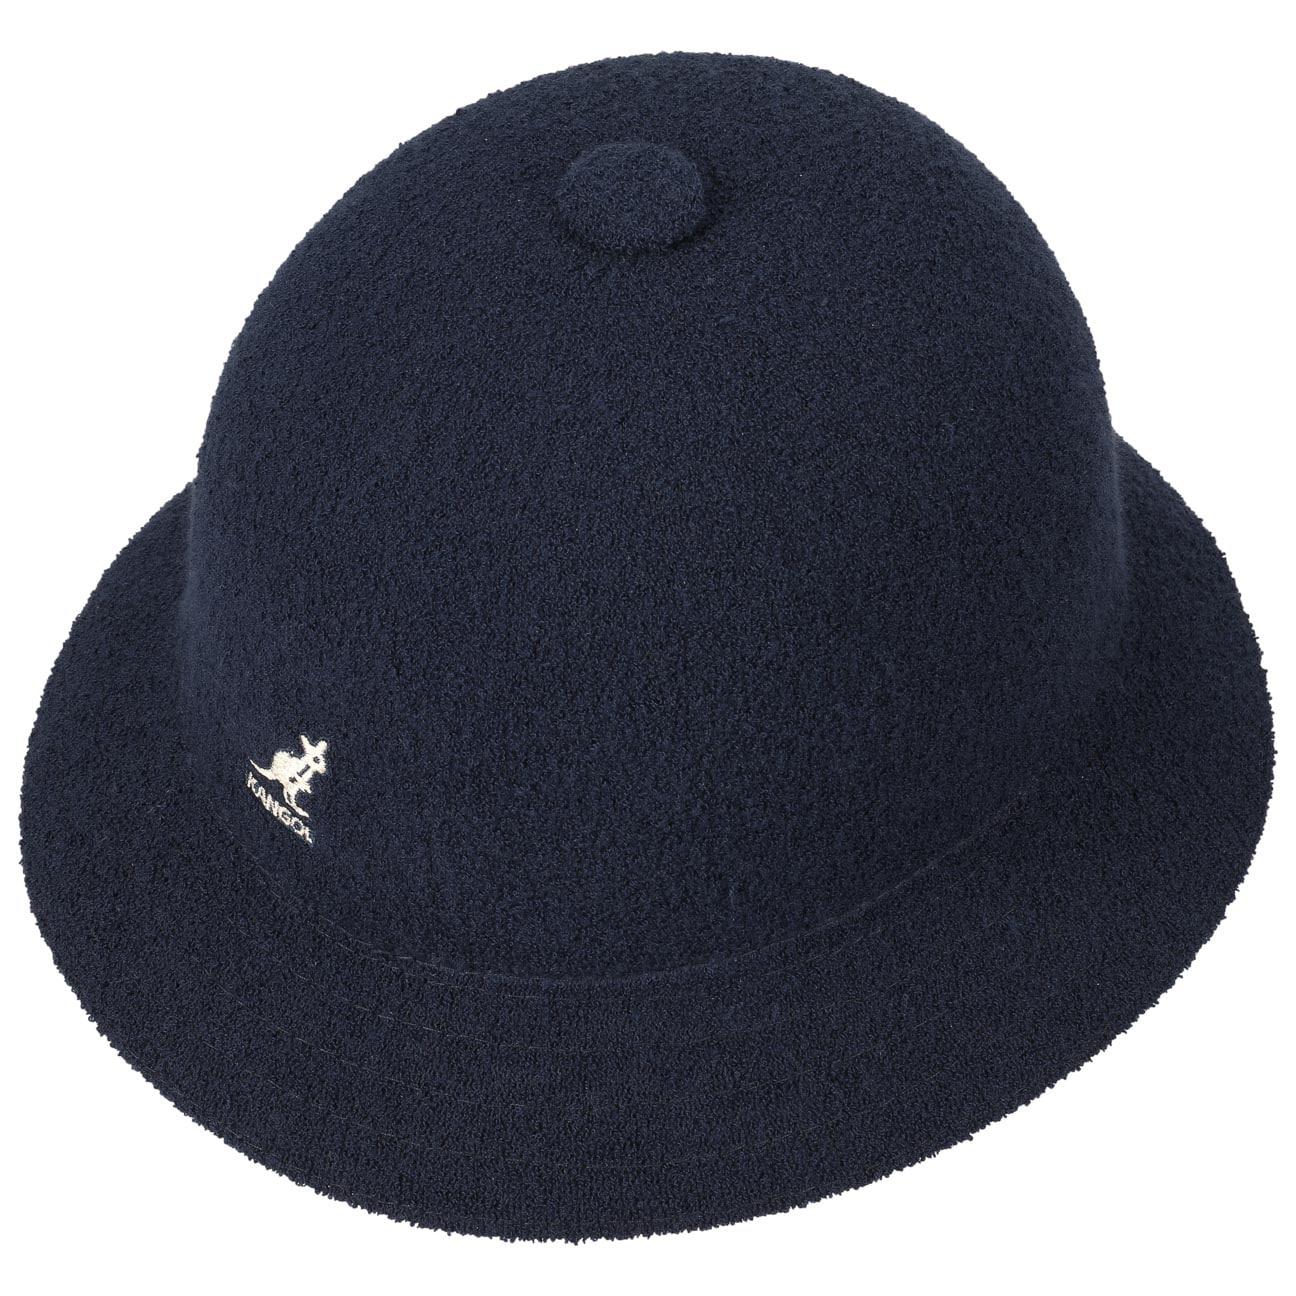 65d89070b2cdf0 Bermuda Casual Bucket Hat by Kangol - blue 2 ...